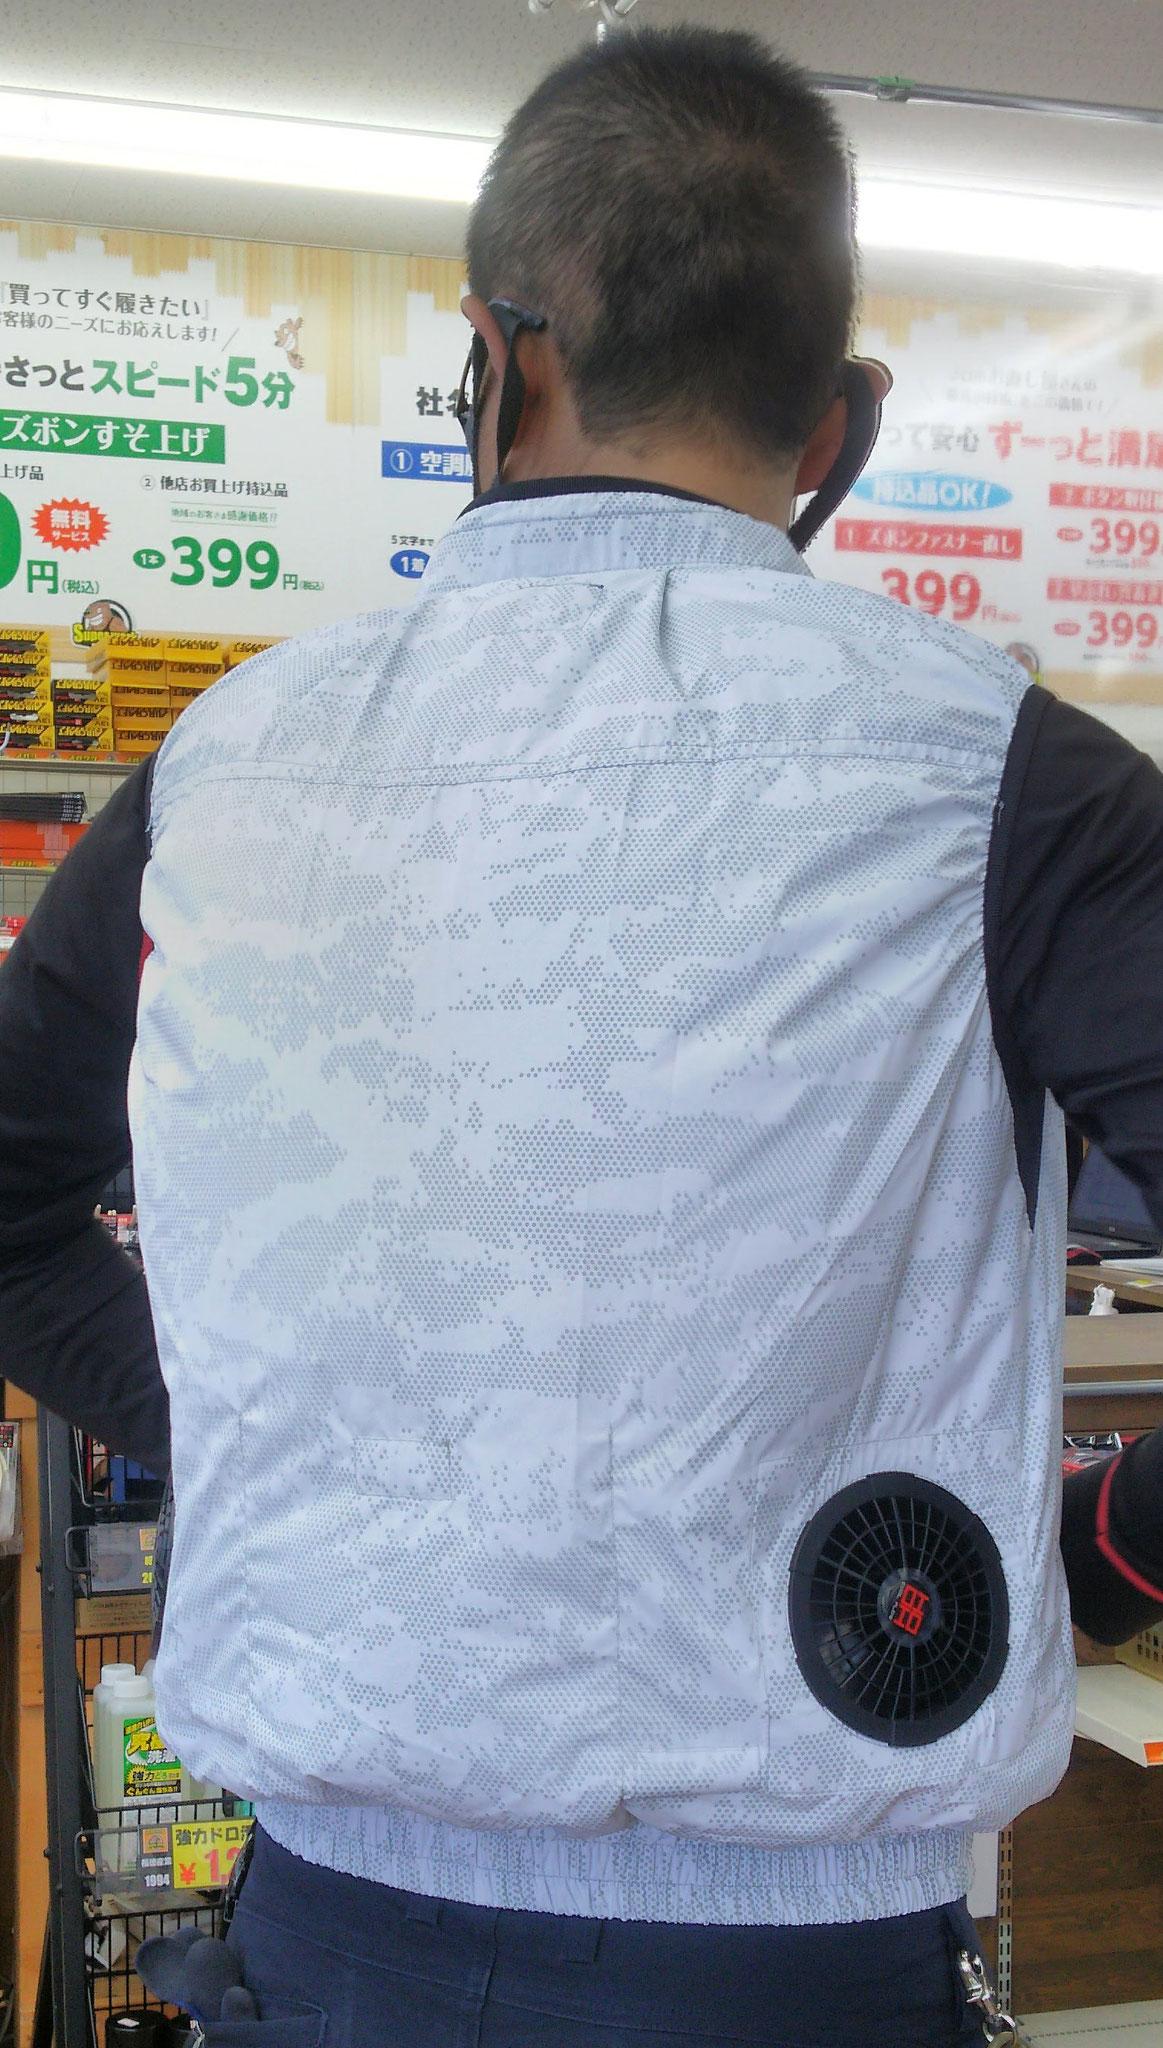 HOOH<鳳皇>V8300 裏チタンベスト ¥3,990(税込)